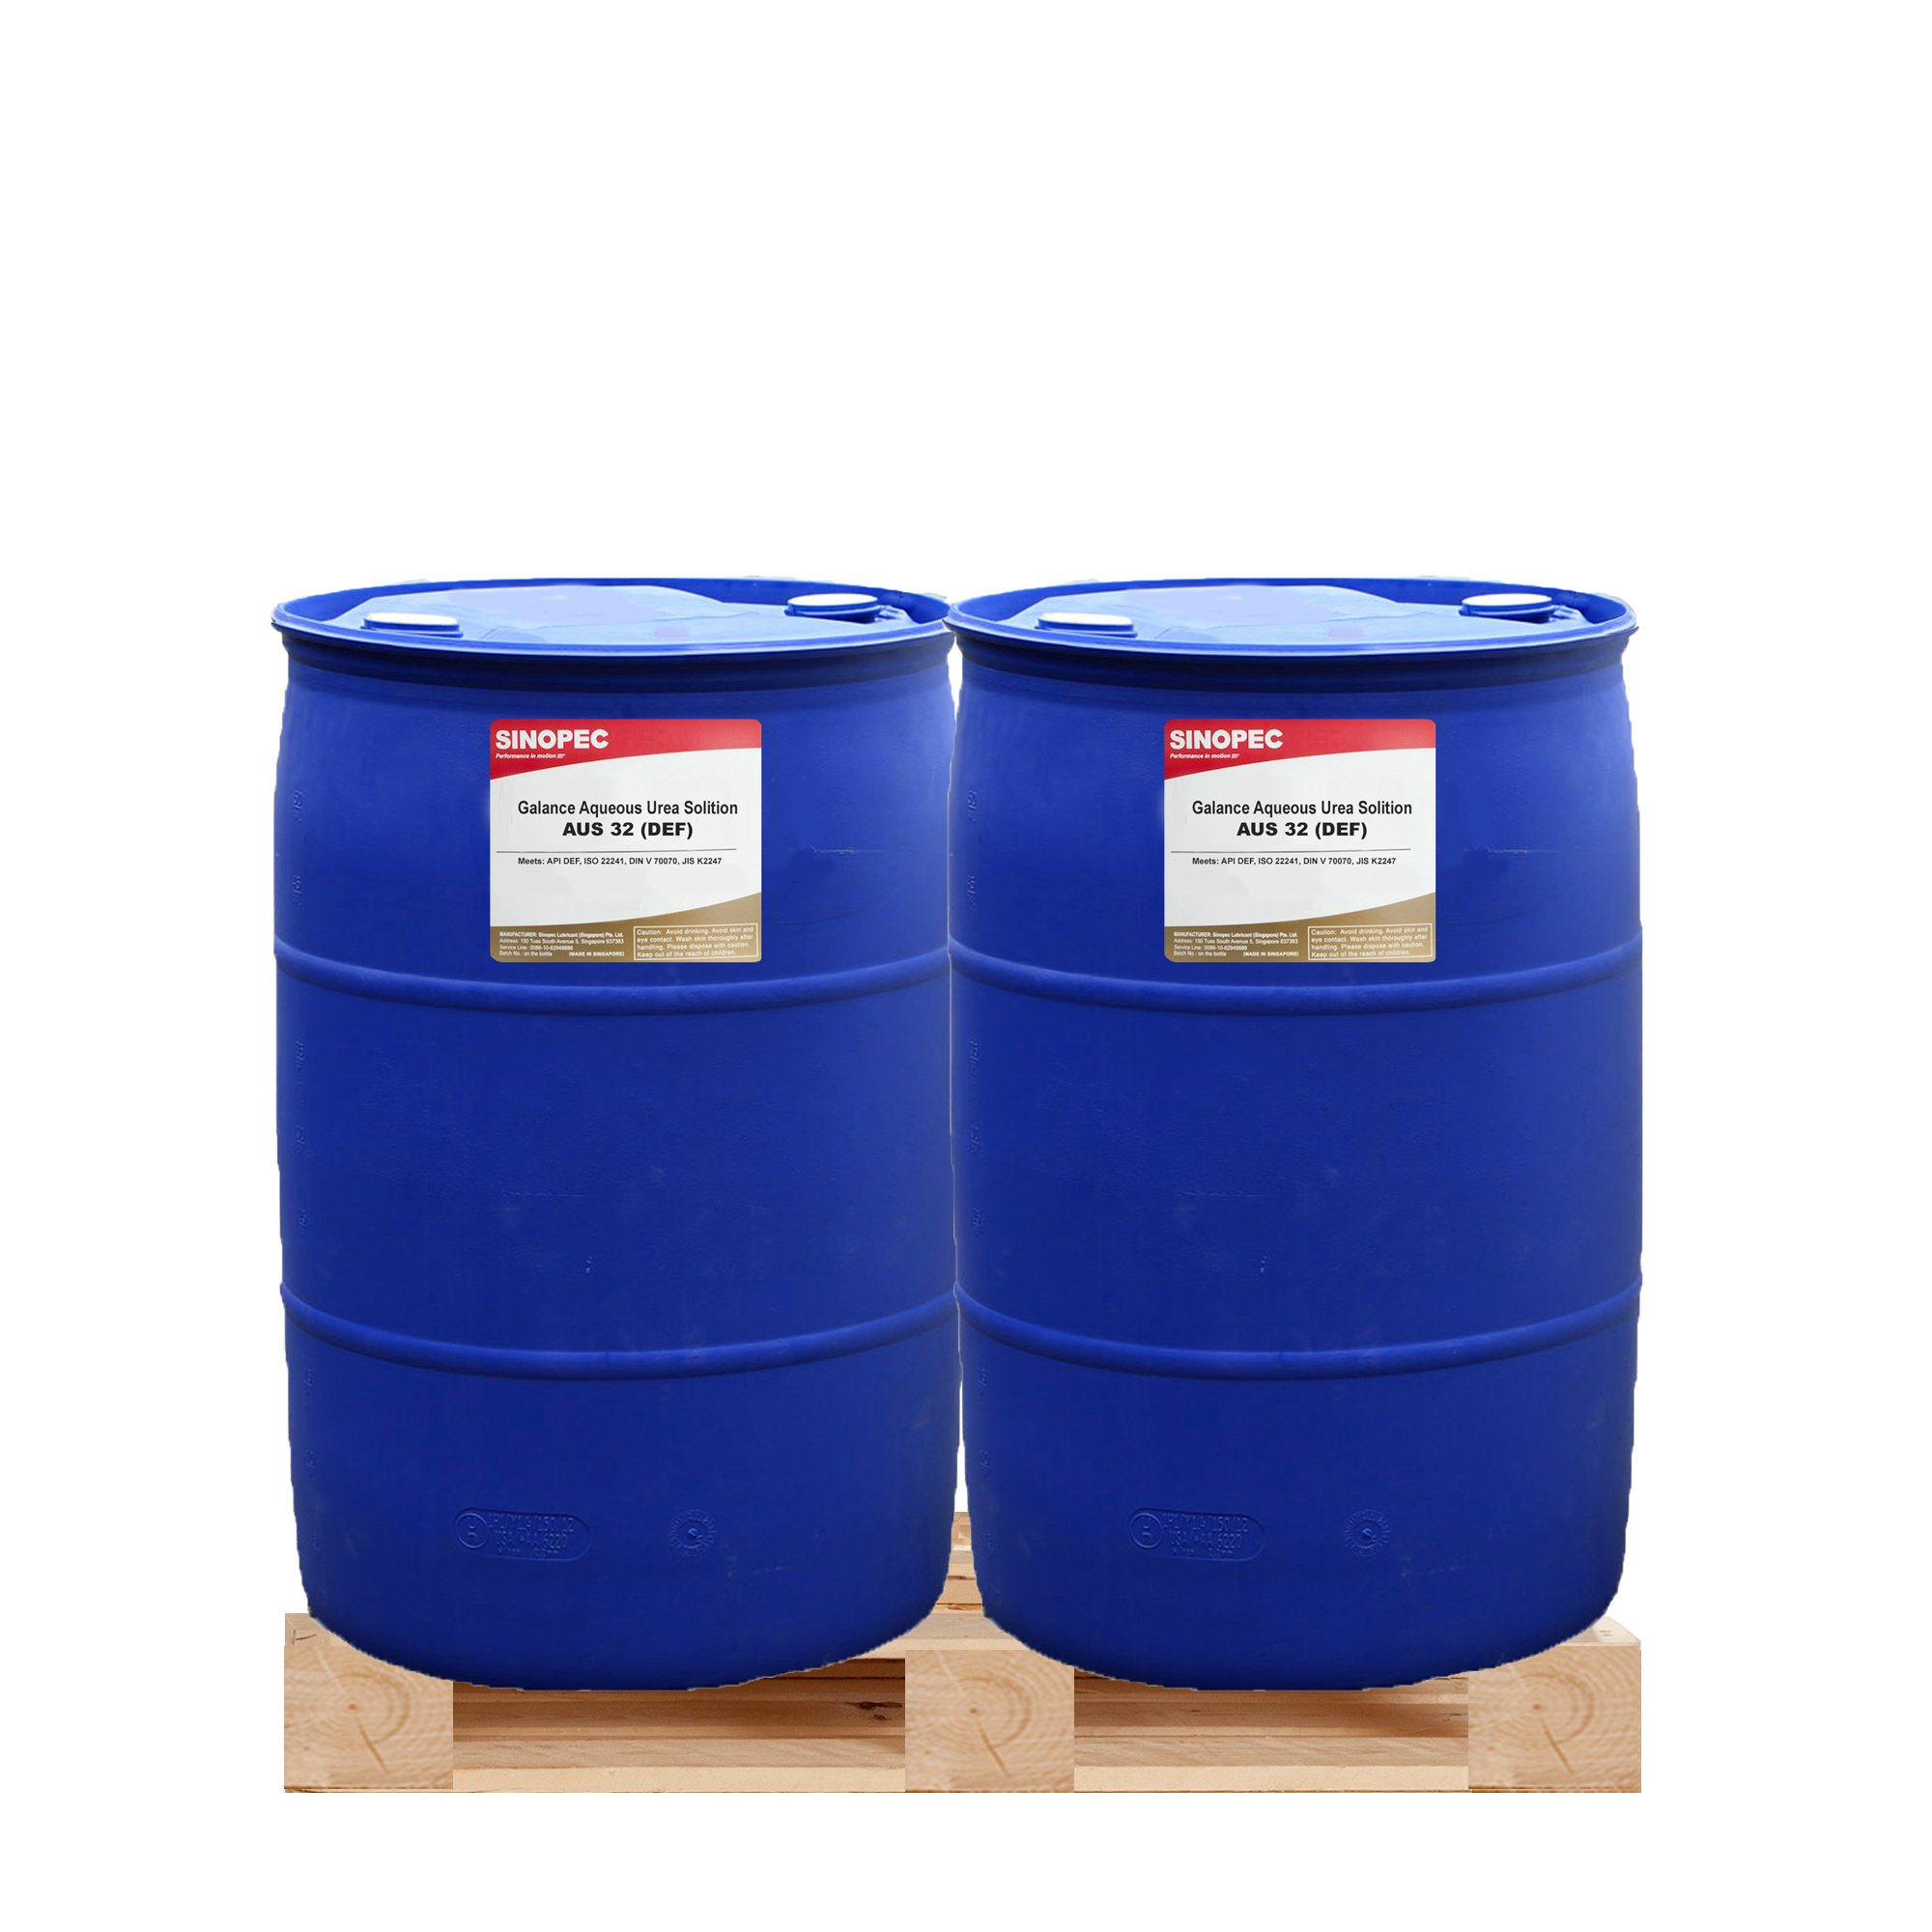 $200 EACH - DEF Diesel Exhaust Fluid - (2) 55 Gallon Drums